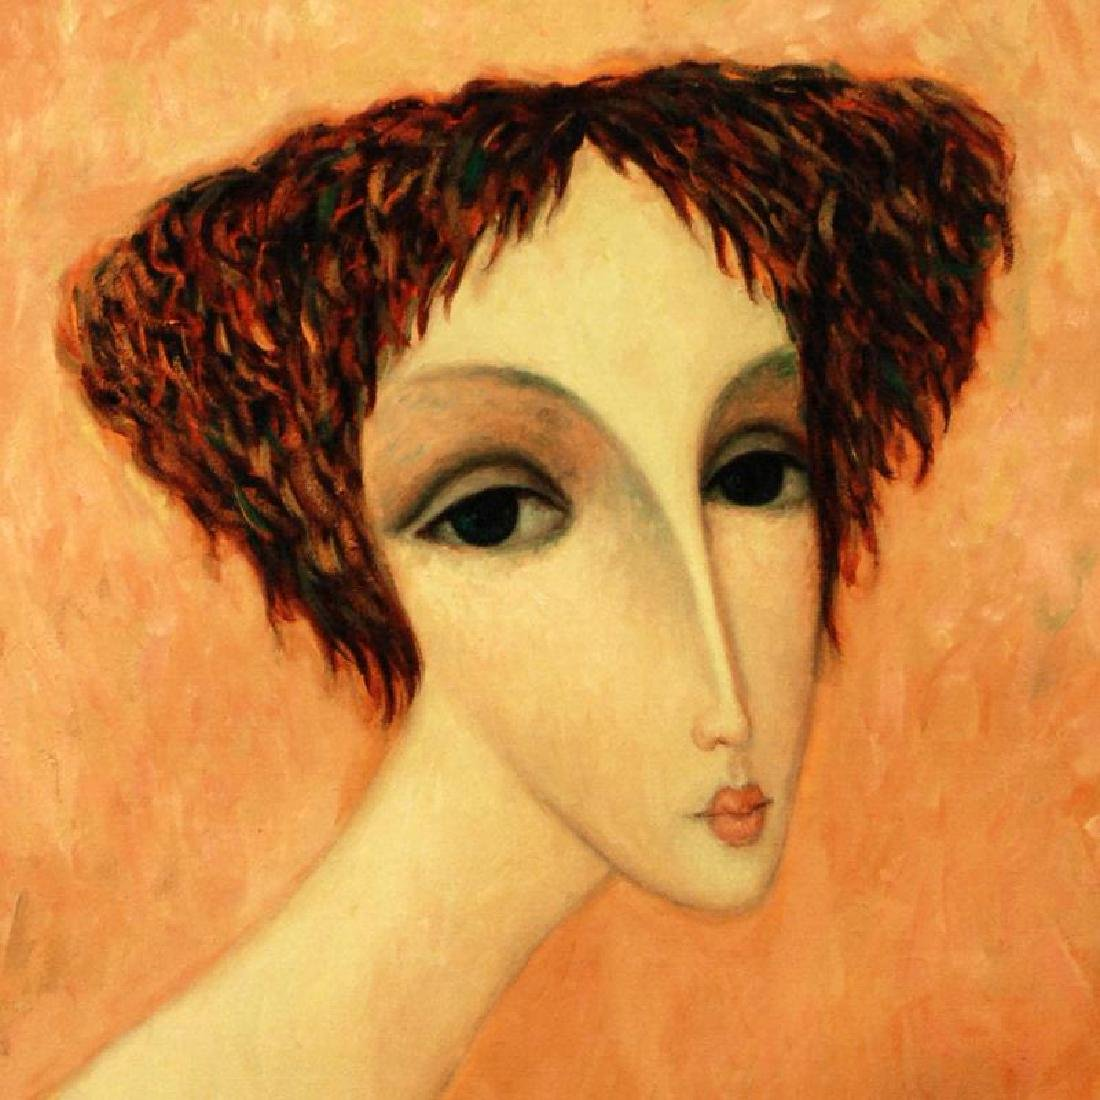 Tamara by Smirnov (1953-2006) - 2